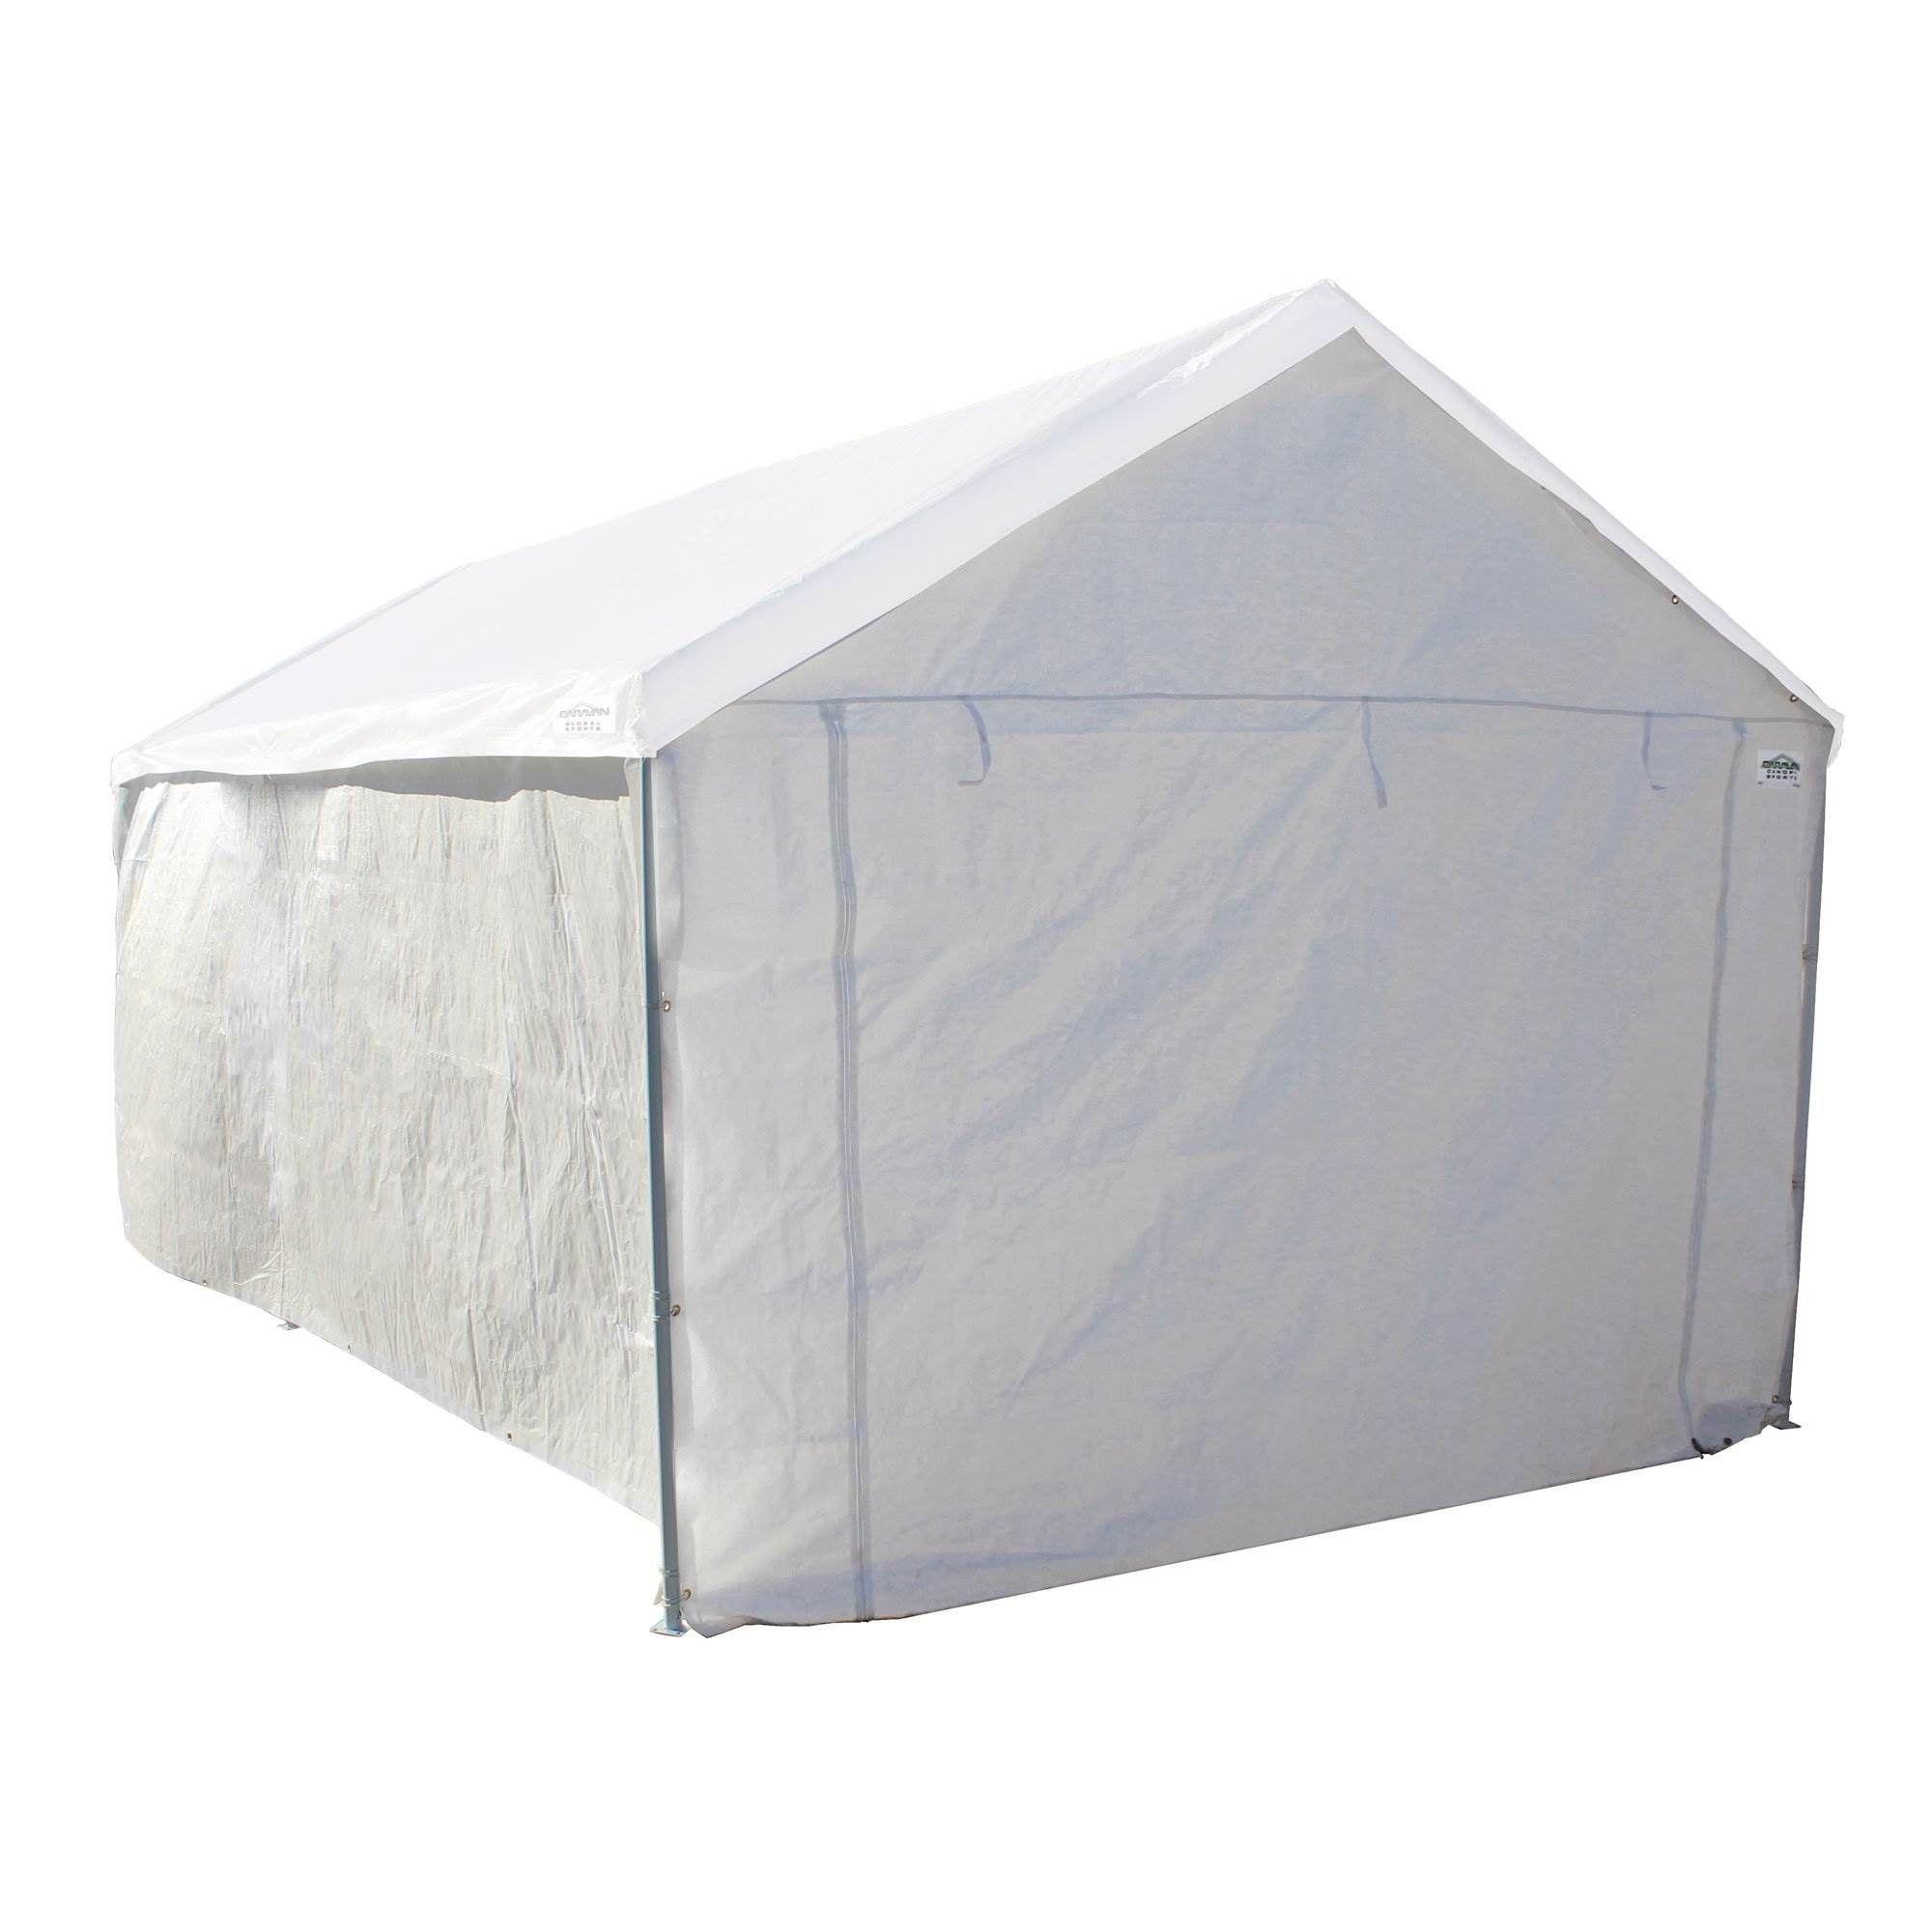 Caravan Canopy Domain Car Port Tent Sidewalls w/ Straps